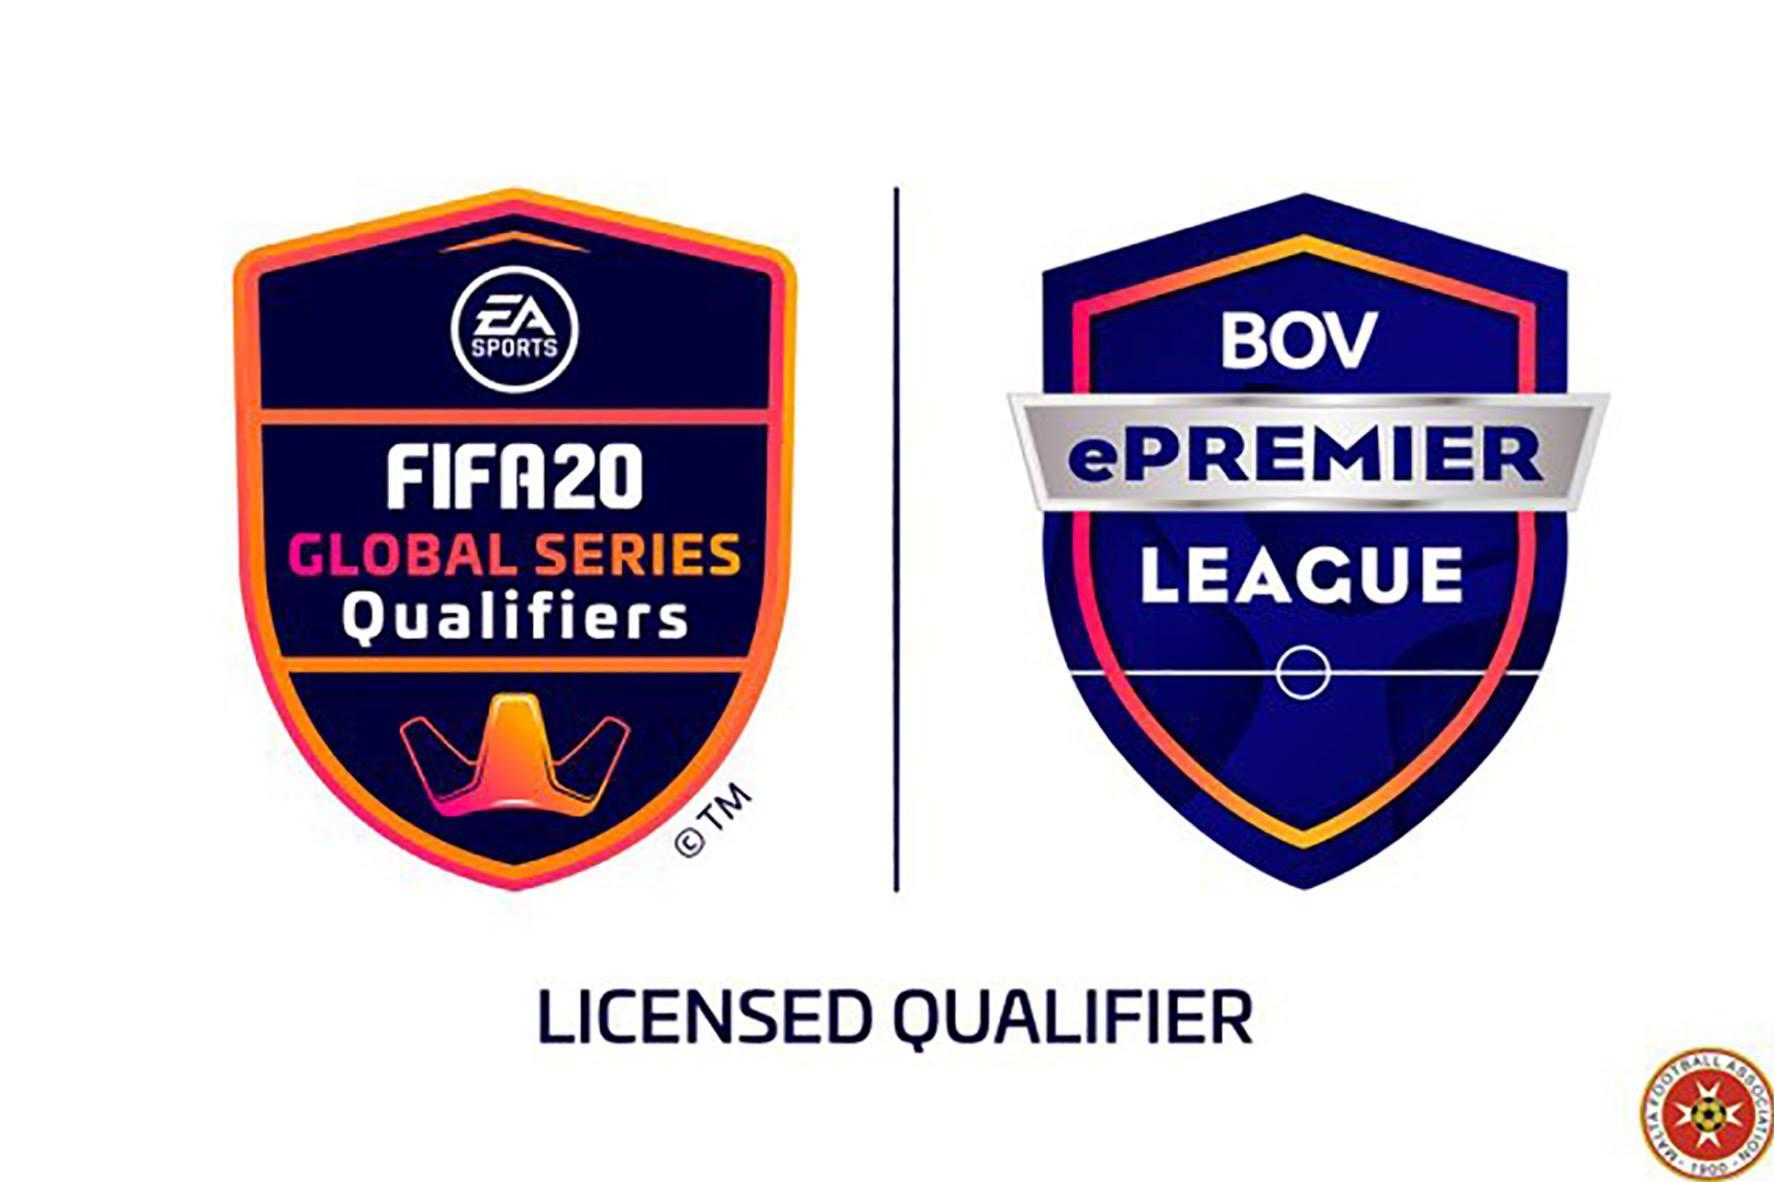 MFA strikes EA SPORTS FIFA partnership for ePremier League